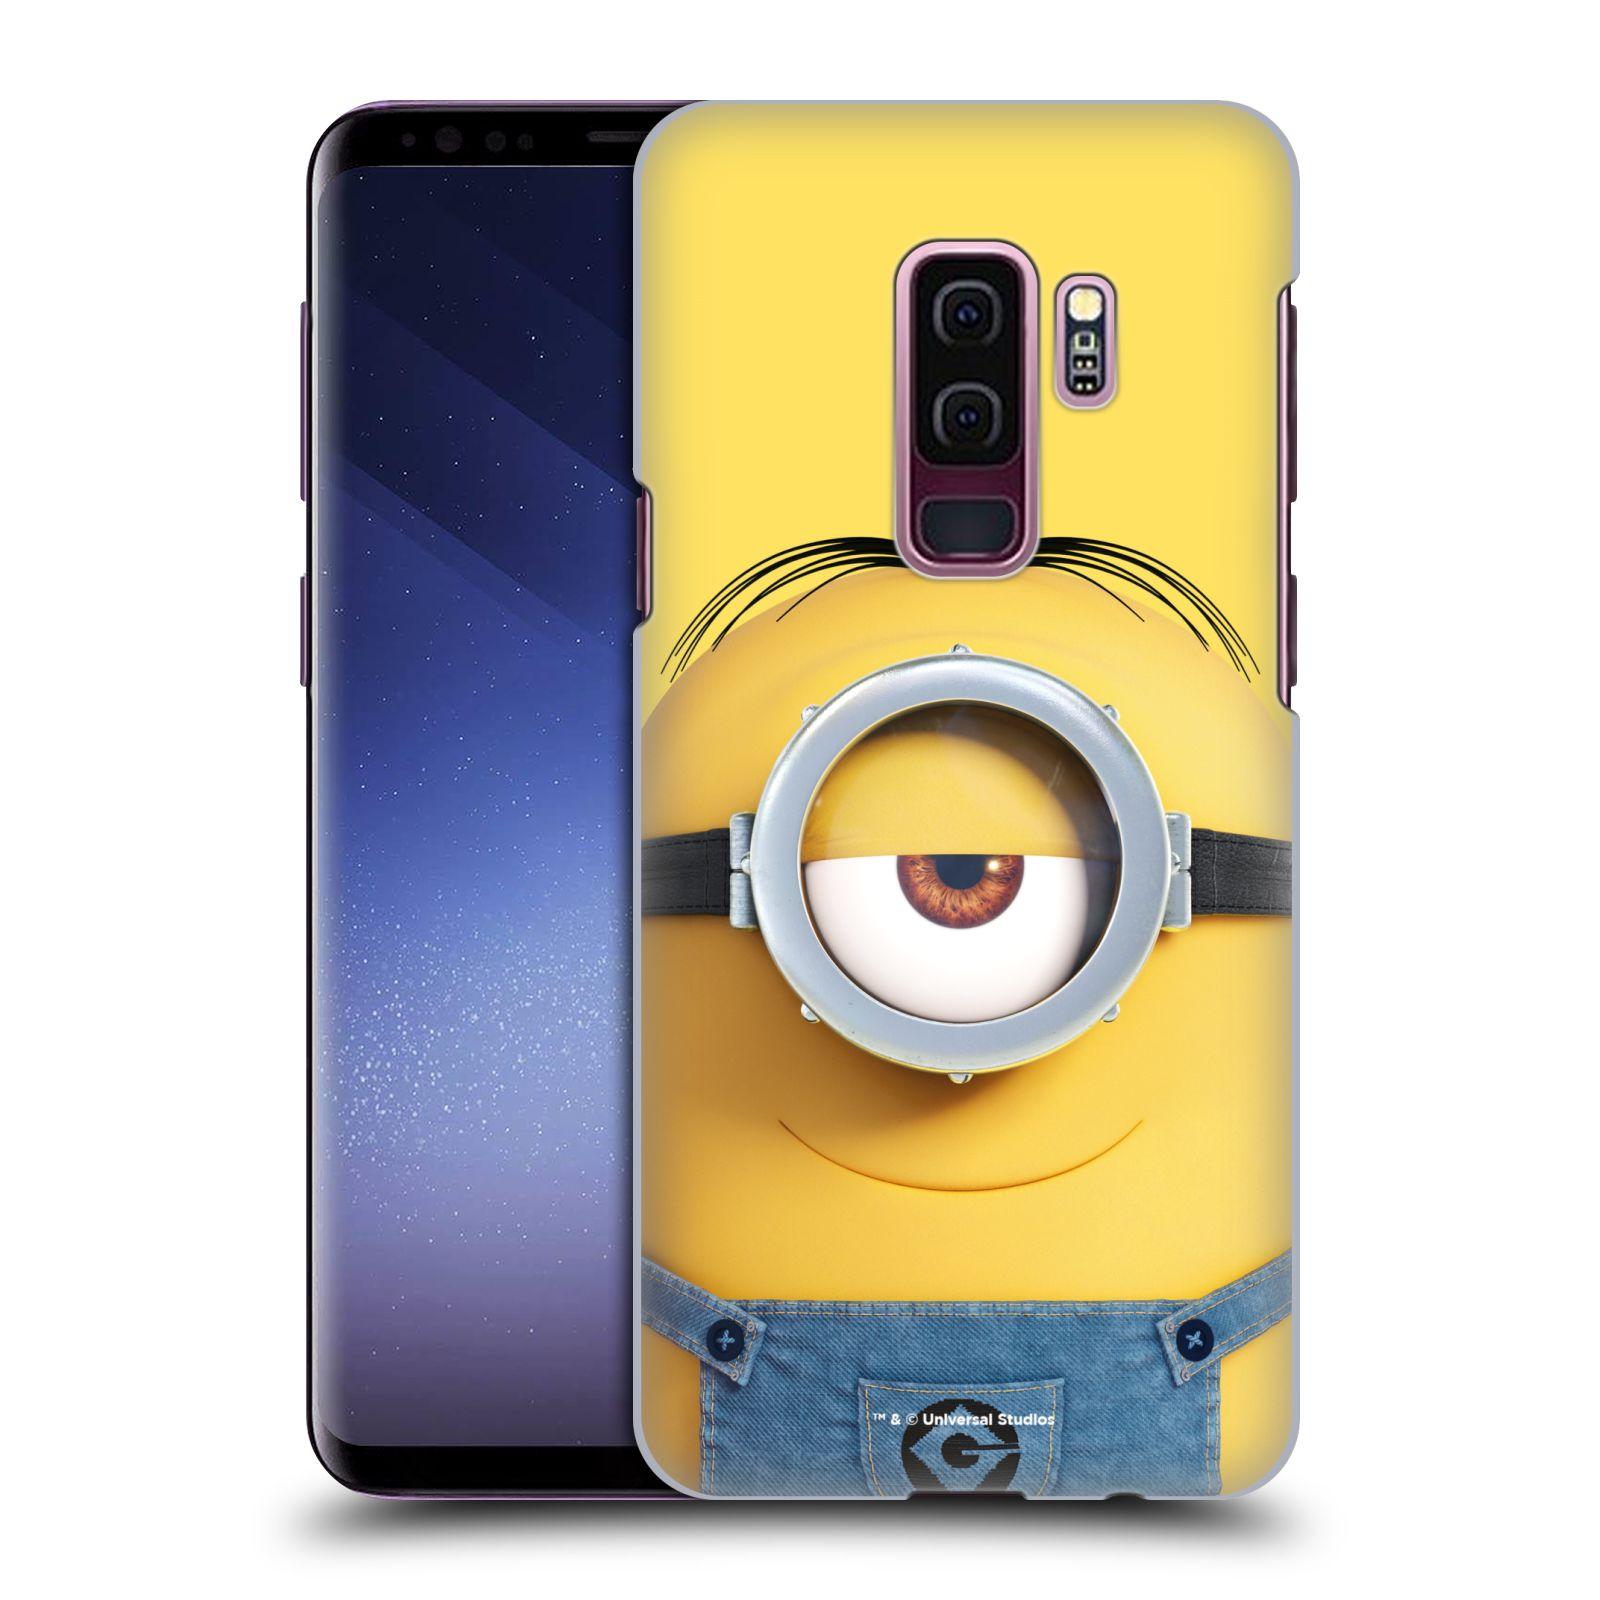 Plastové pouzdro na mobil Samsung Galaxy S9 Plus - Head Case - Mimoň Stuart z filmu Já, padouch - Despicable Me